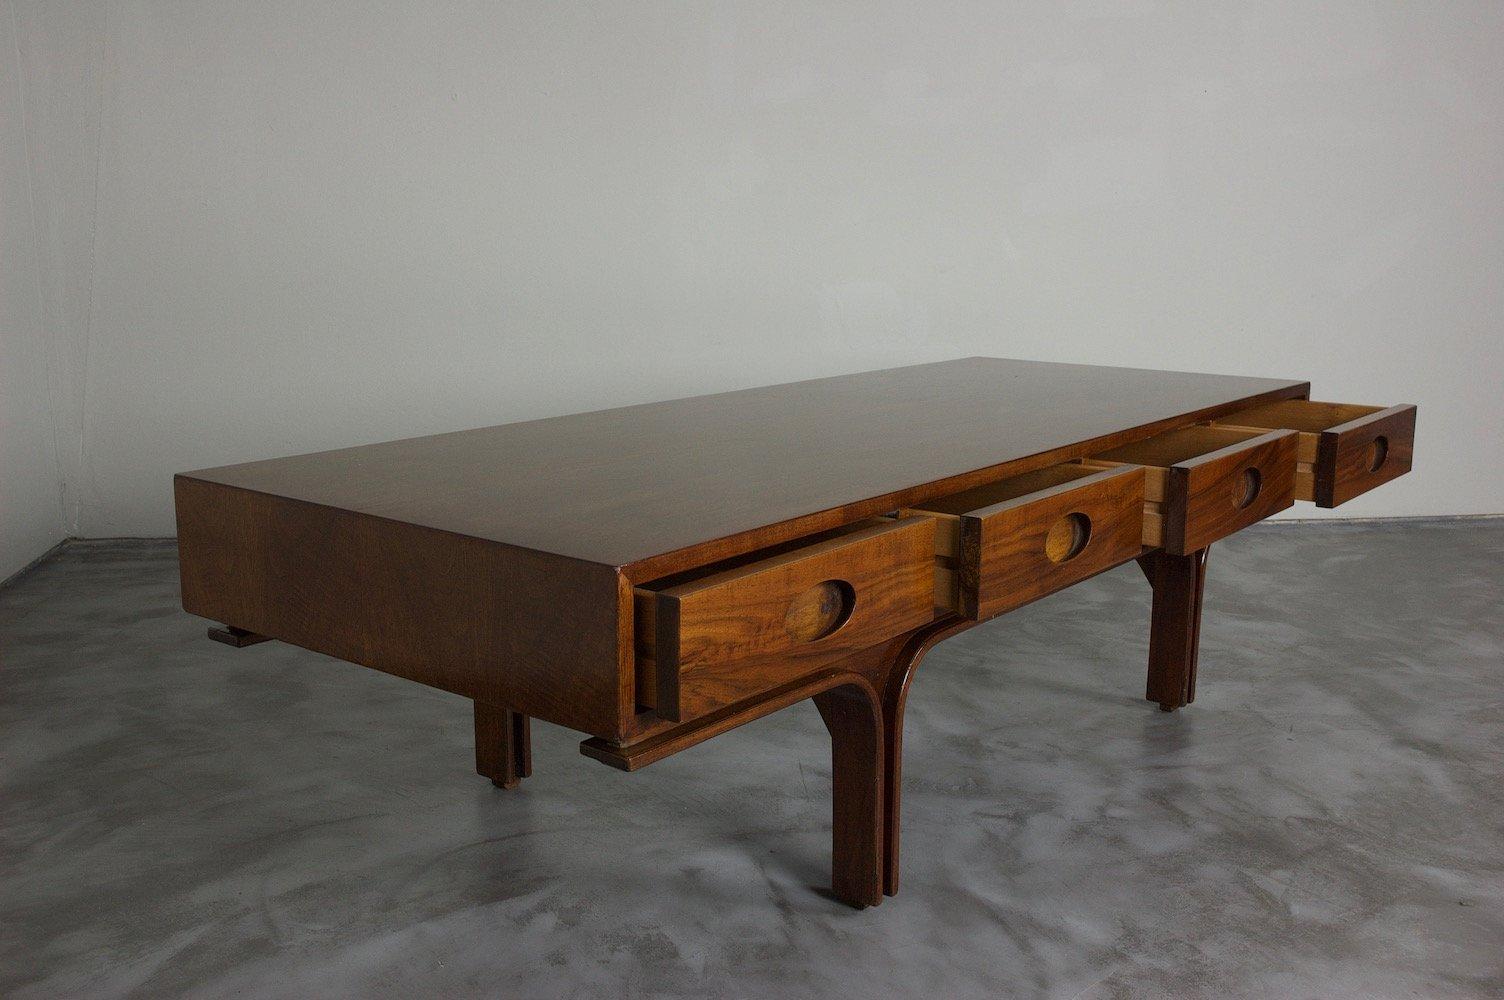 Italian coffee table by gianfranco frattini for bernini for Italian coffee table